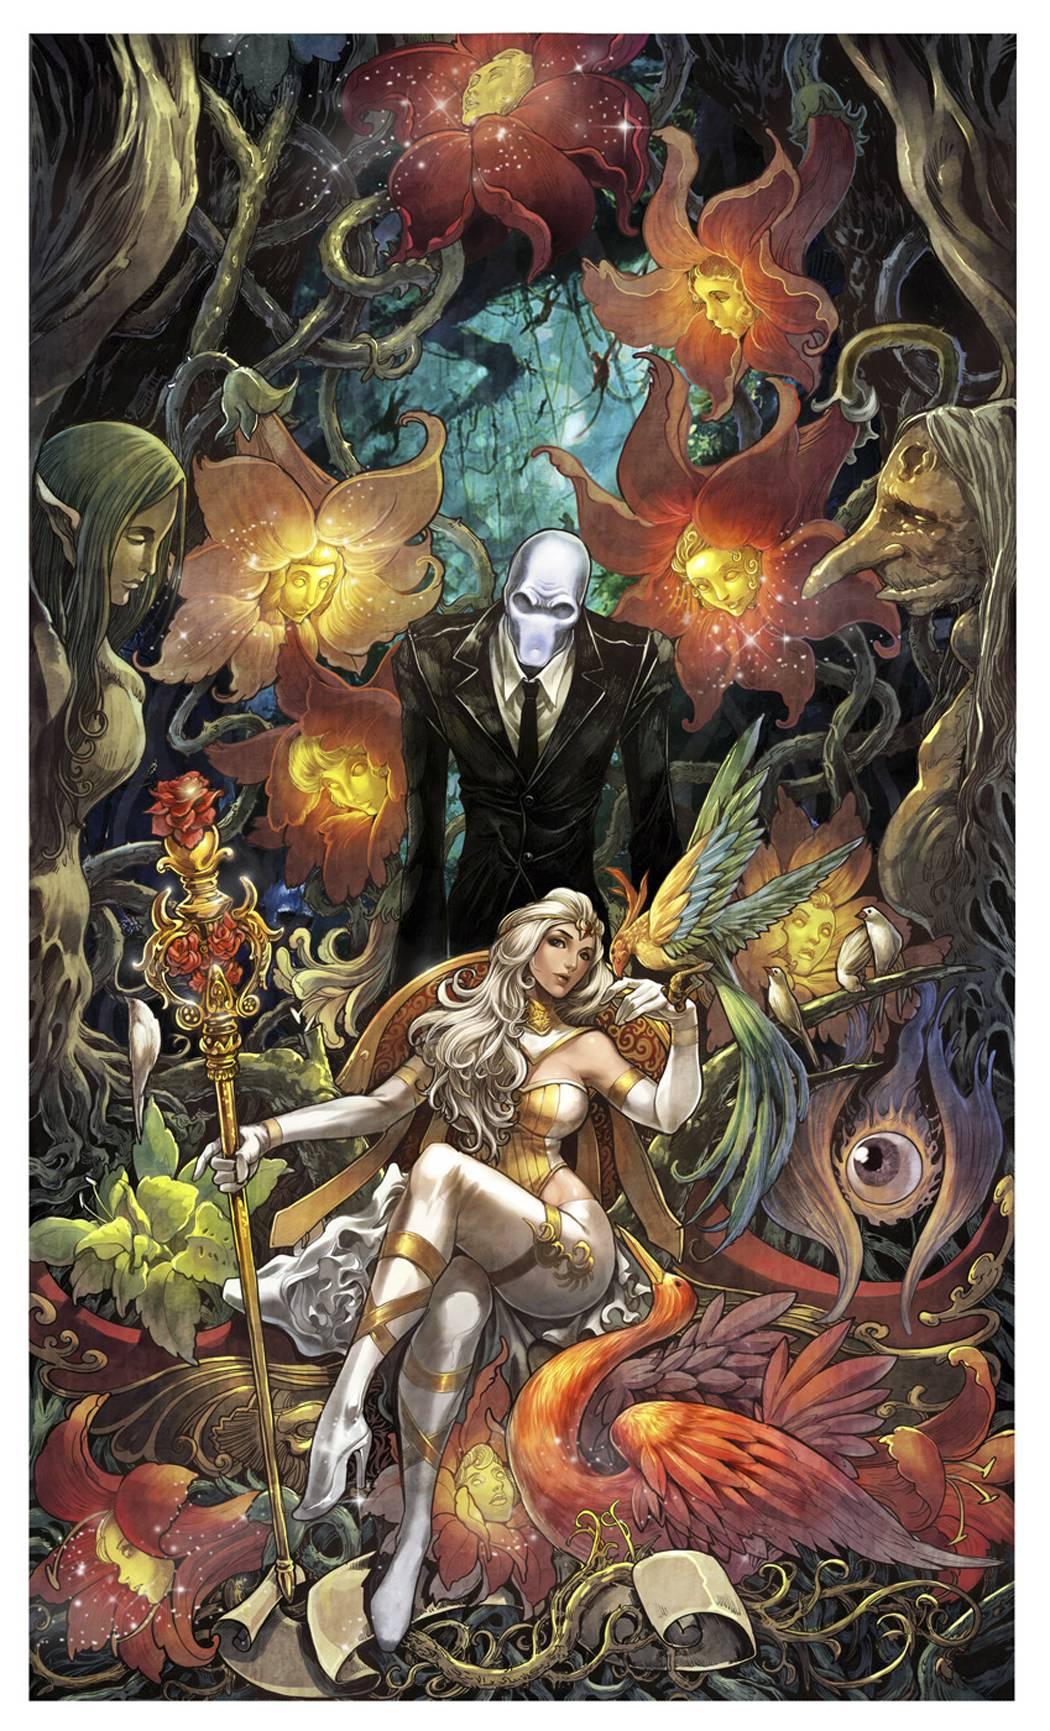 Grimm Fairy Tales Presents Wonderland Vol 1 27 | Zenescope ... |Grimm Fairy Tales Original Art